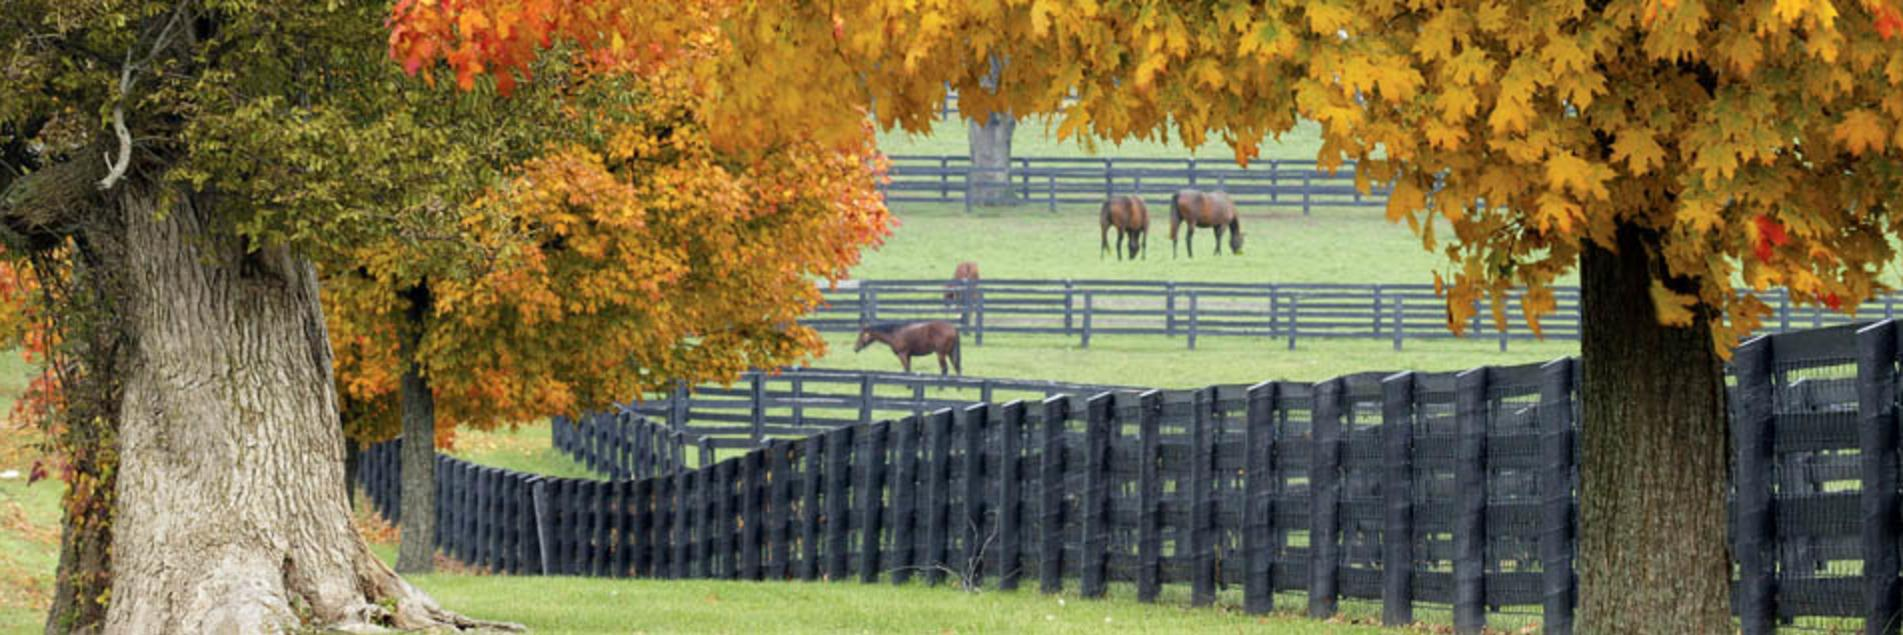 Fall Horse Farm